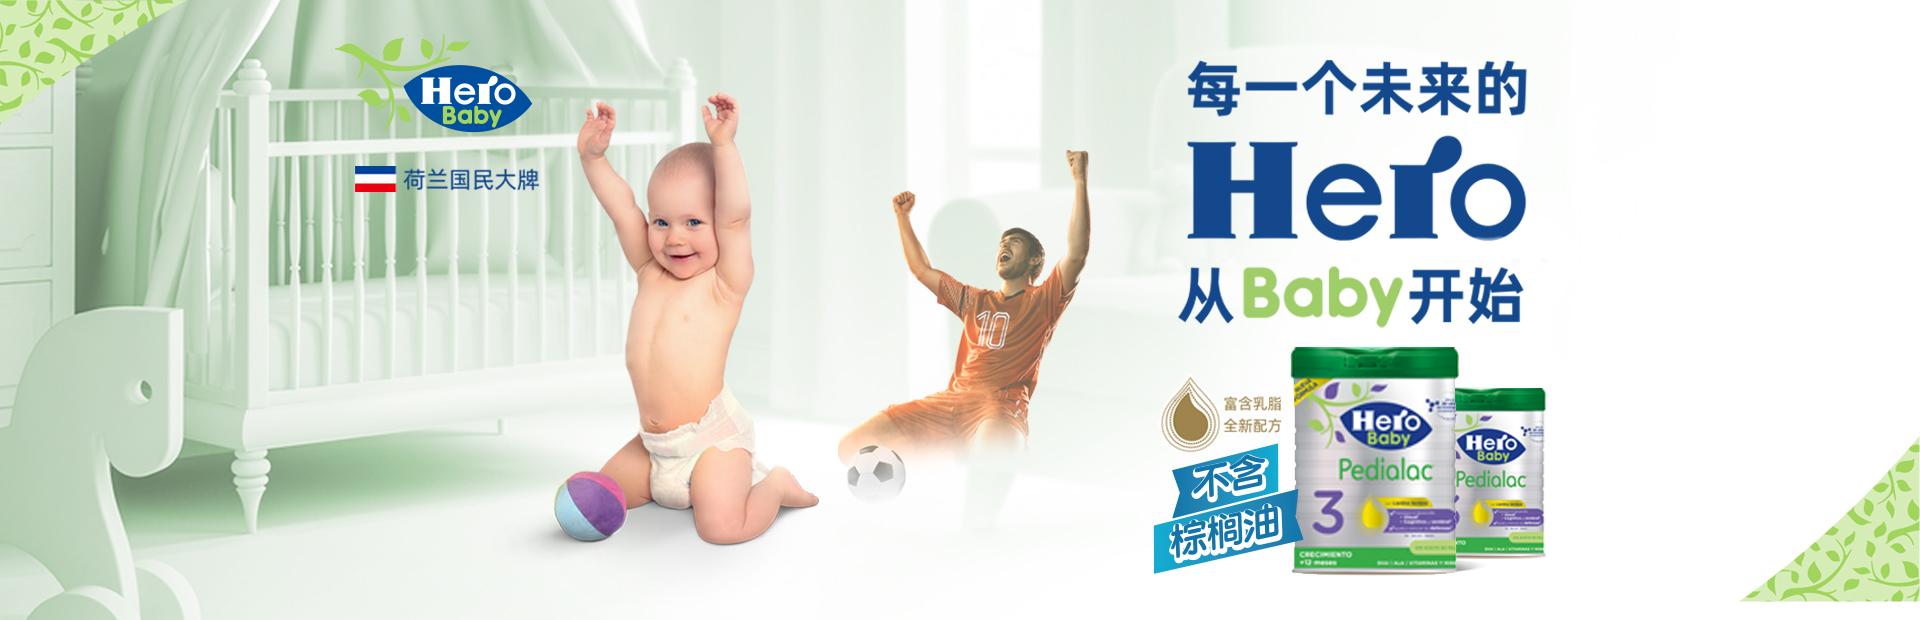 aoa体育app下载时光